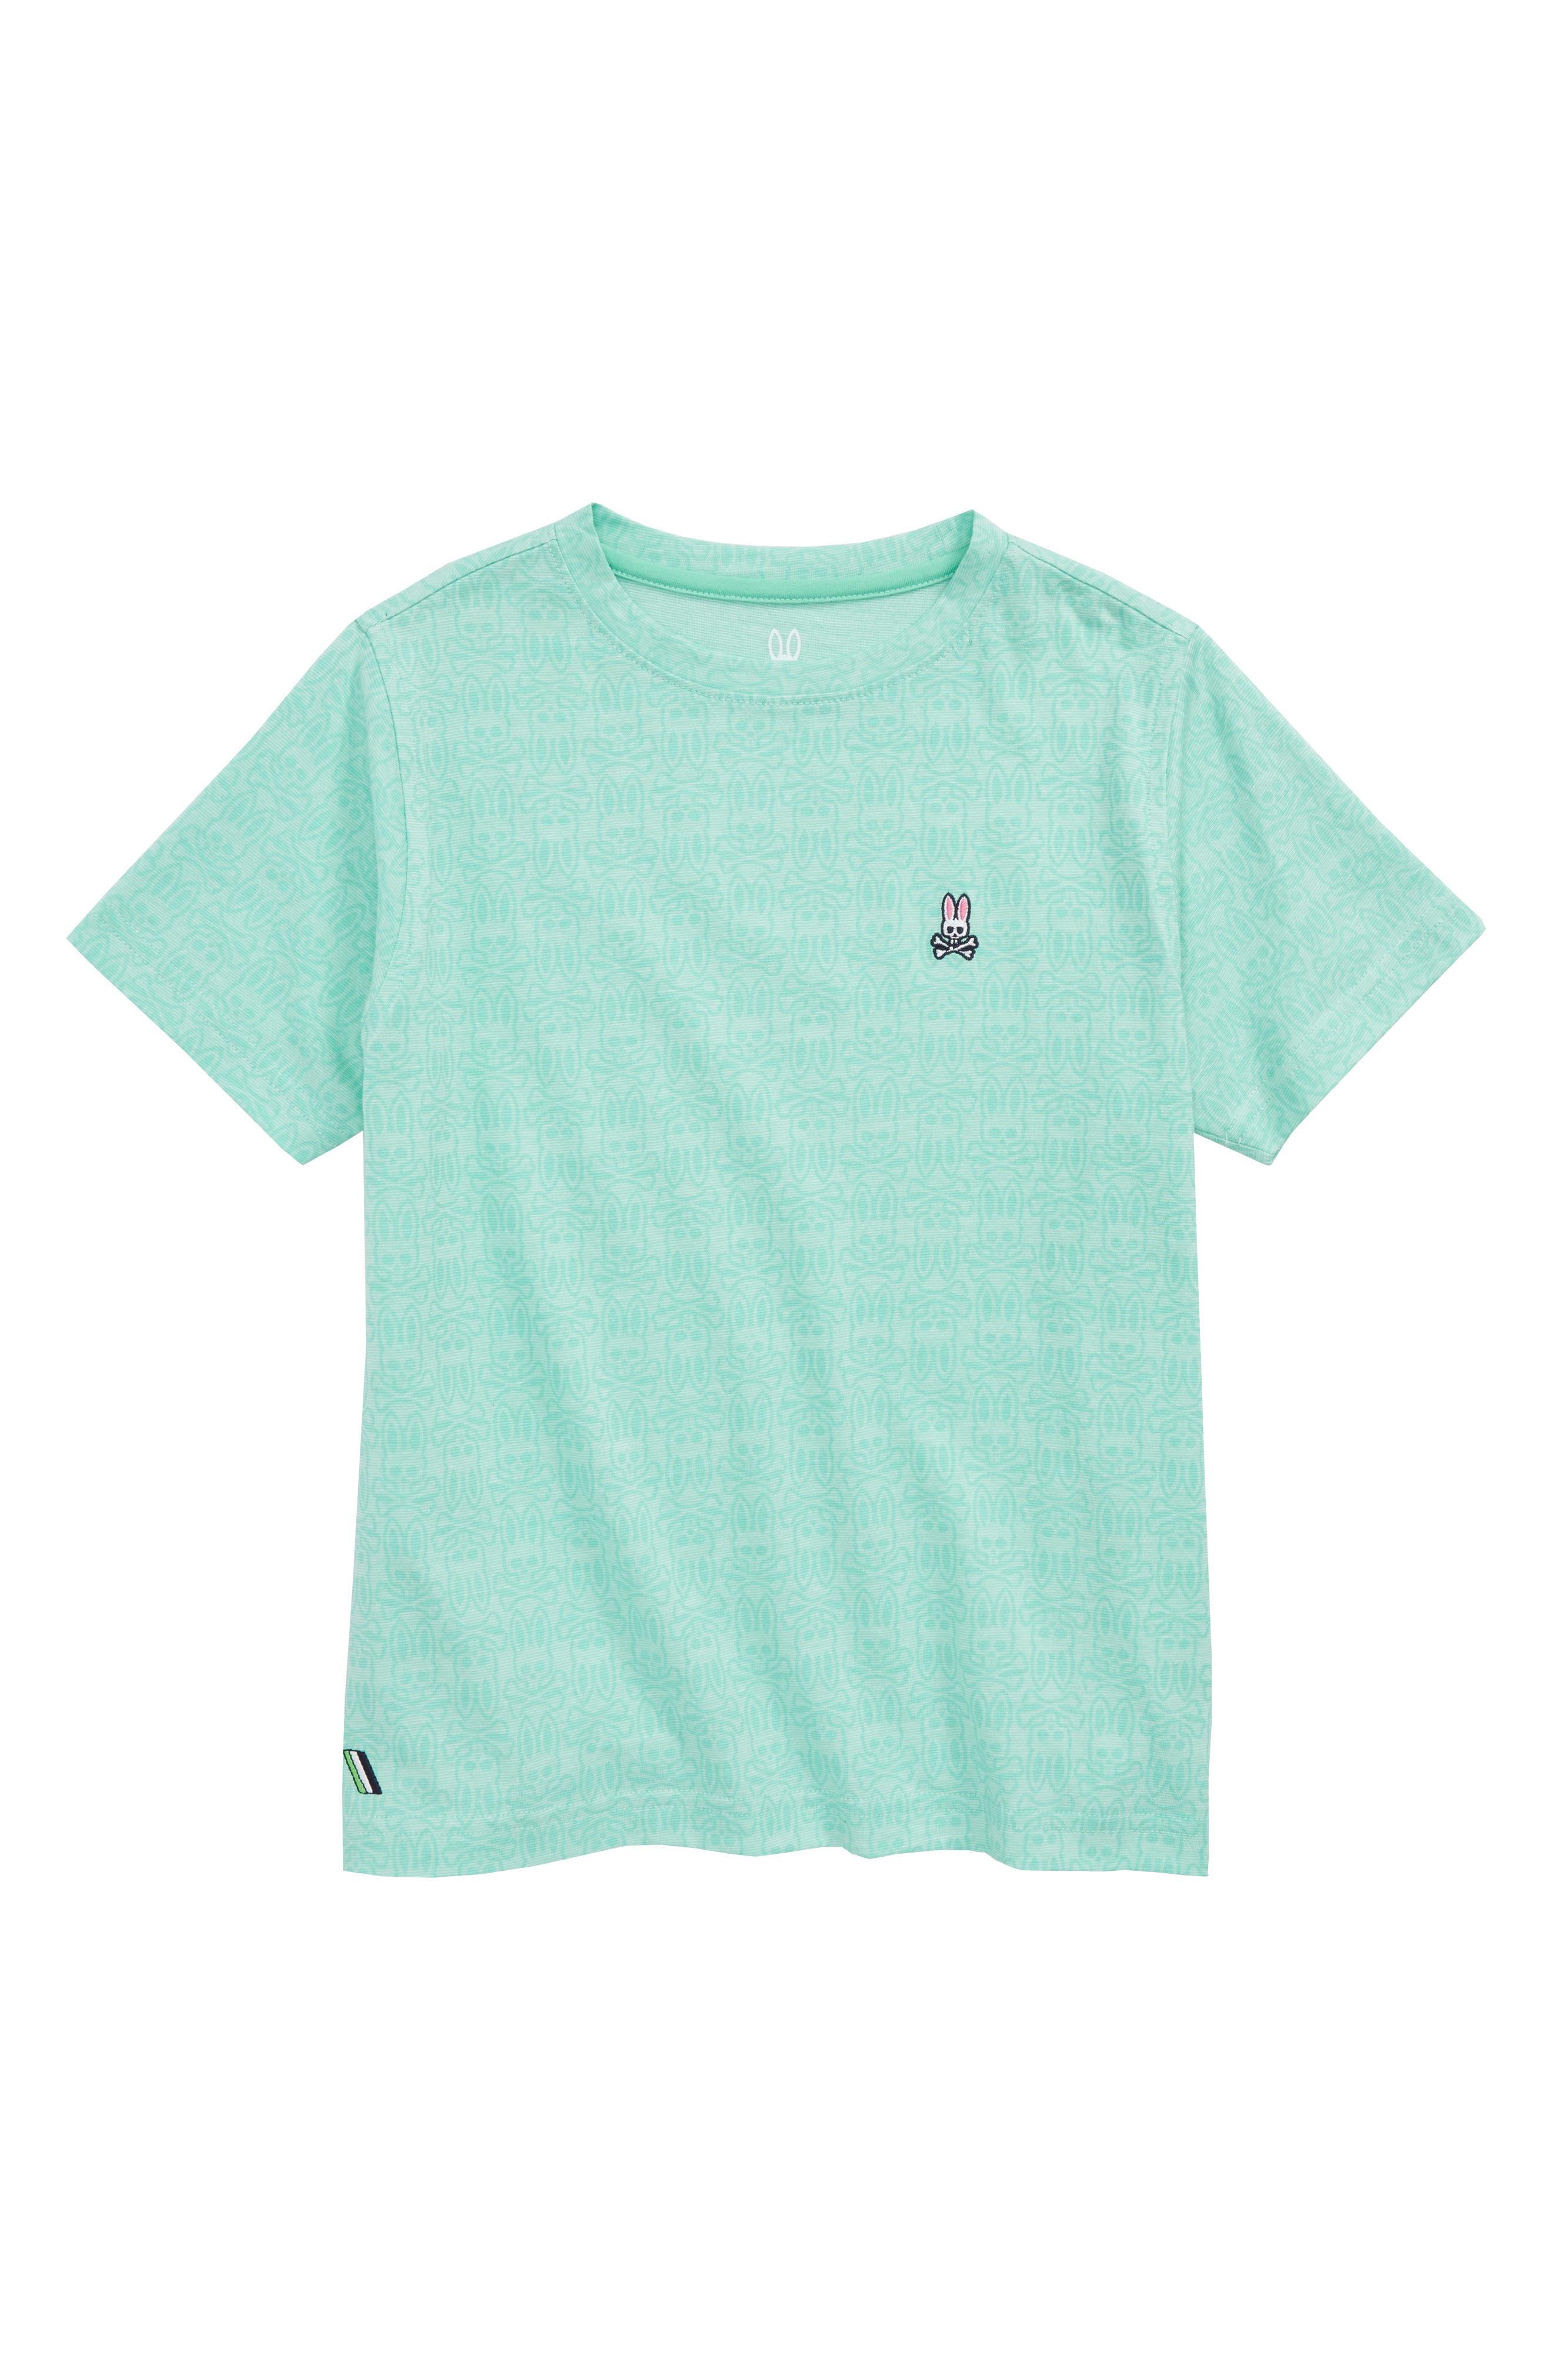 Fareham T-Shirt,                             Main thumbnail 1, color,                             Florida